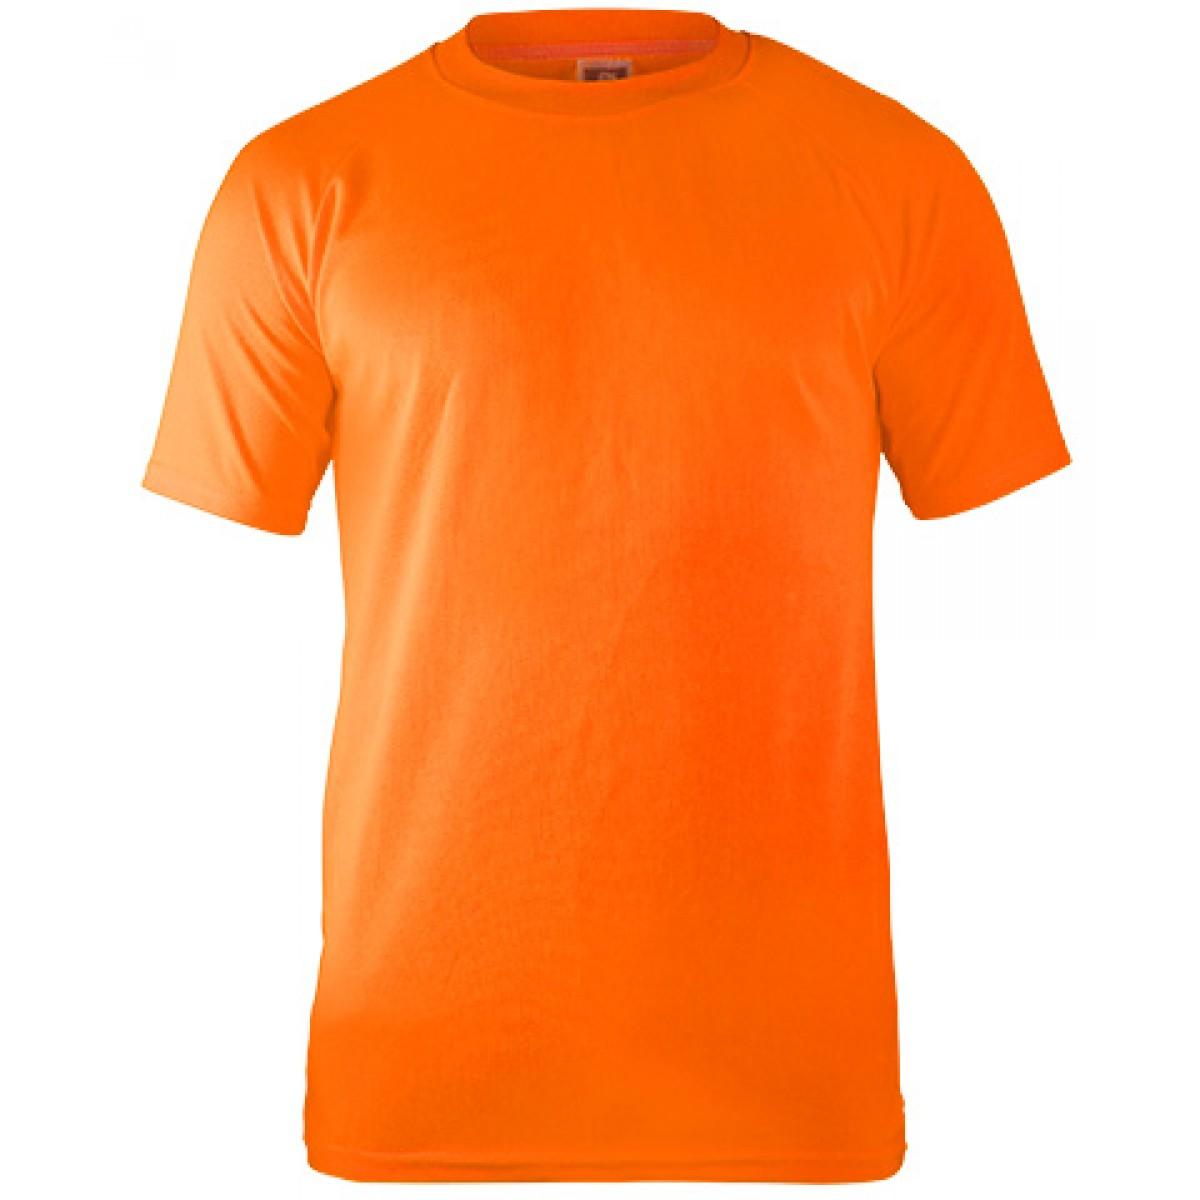 Performance T-shirt-Safety Orange-YS